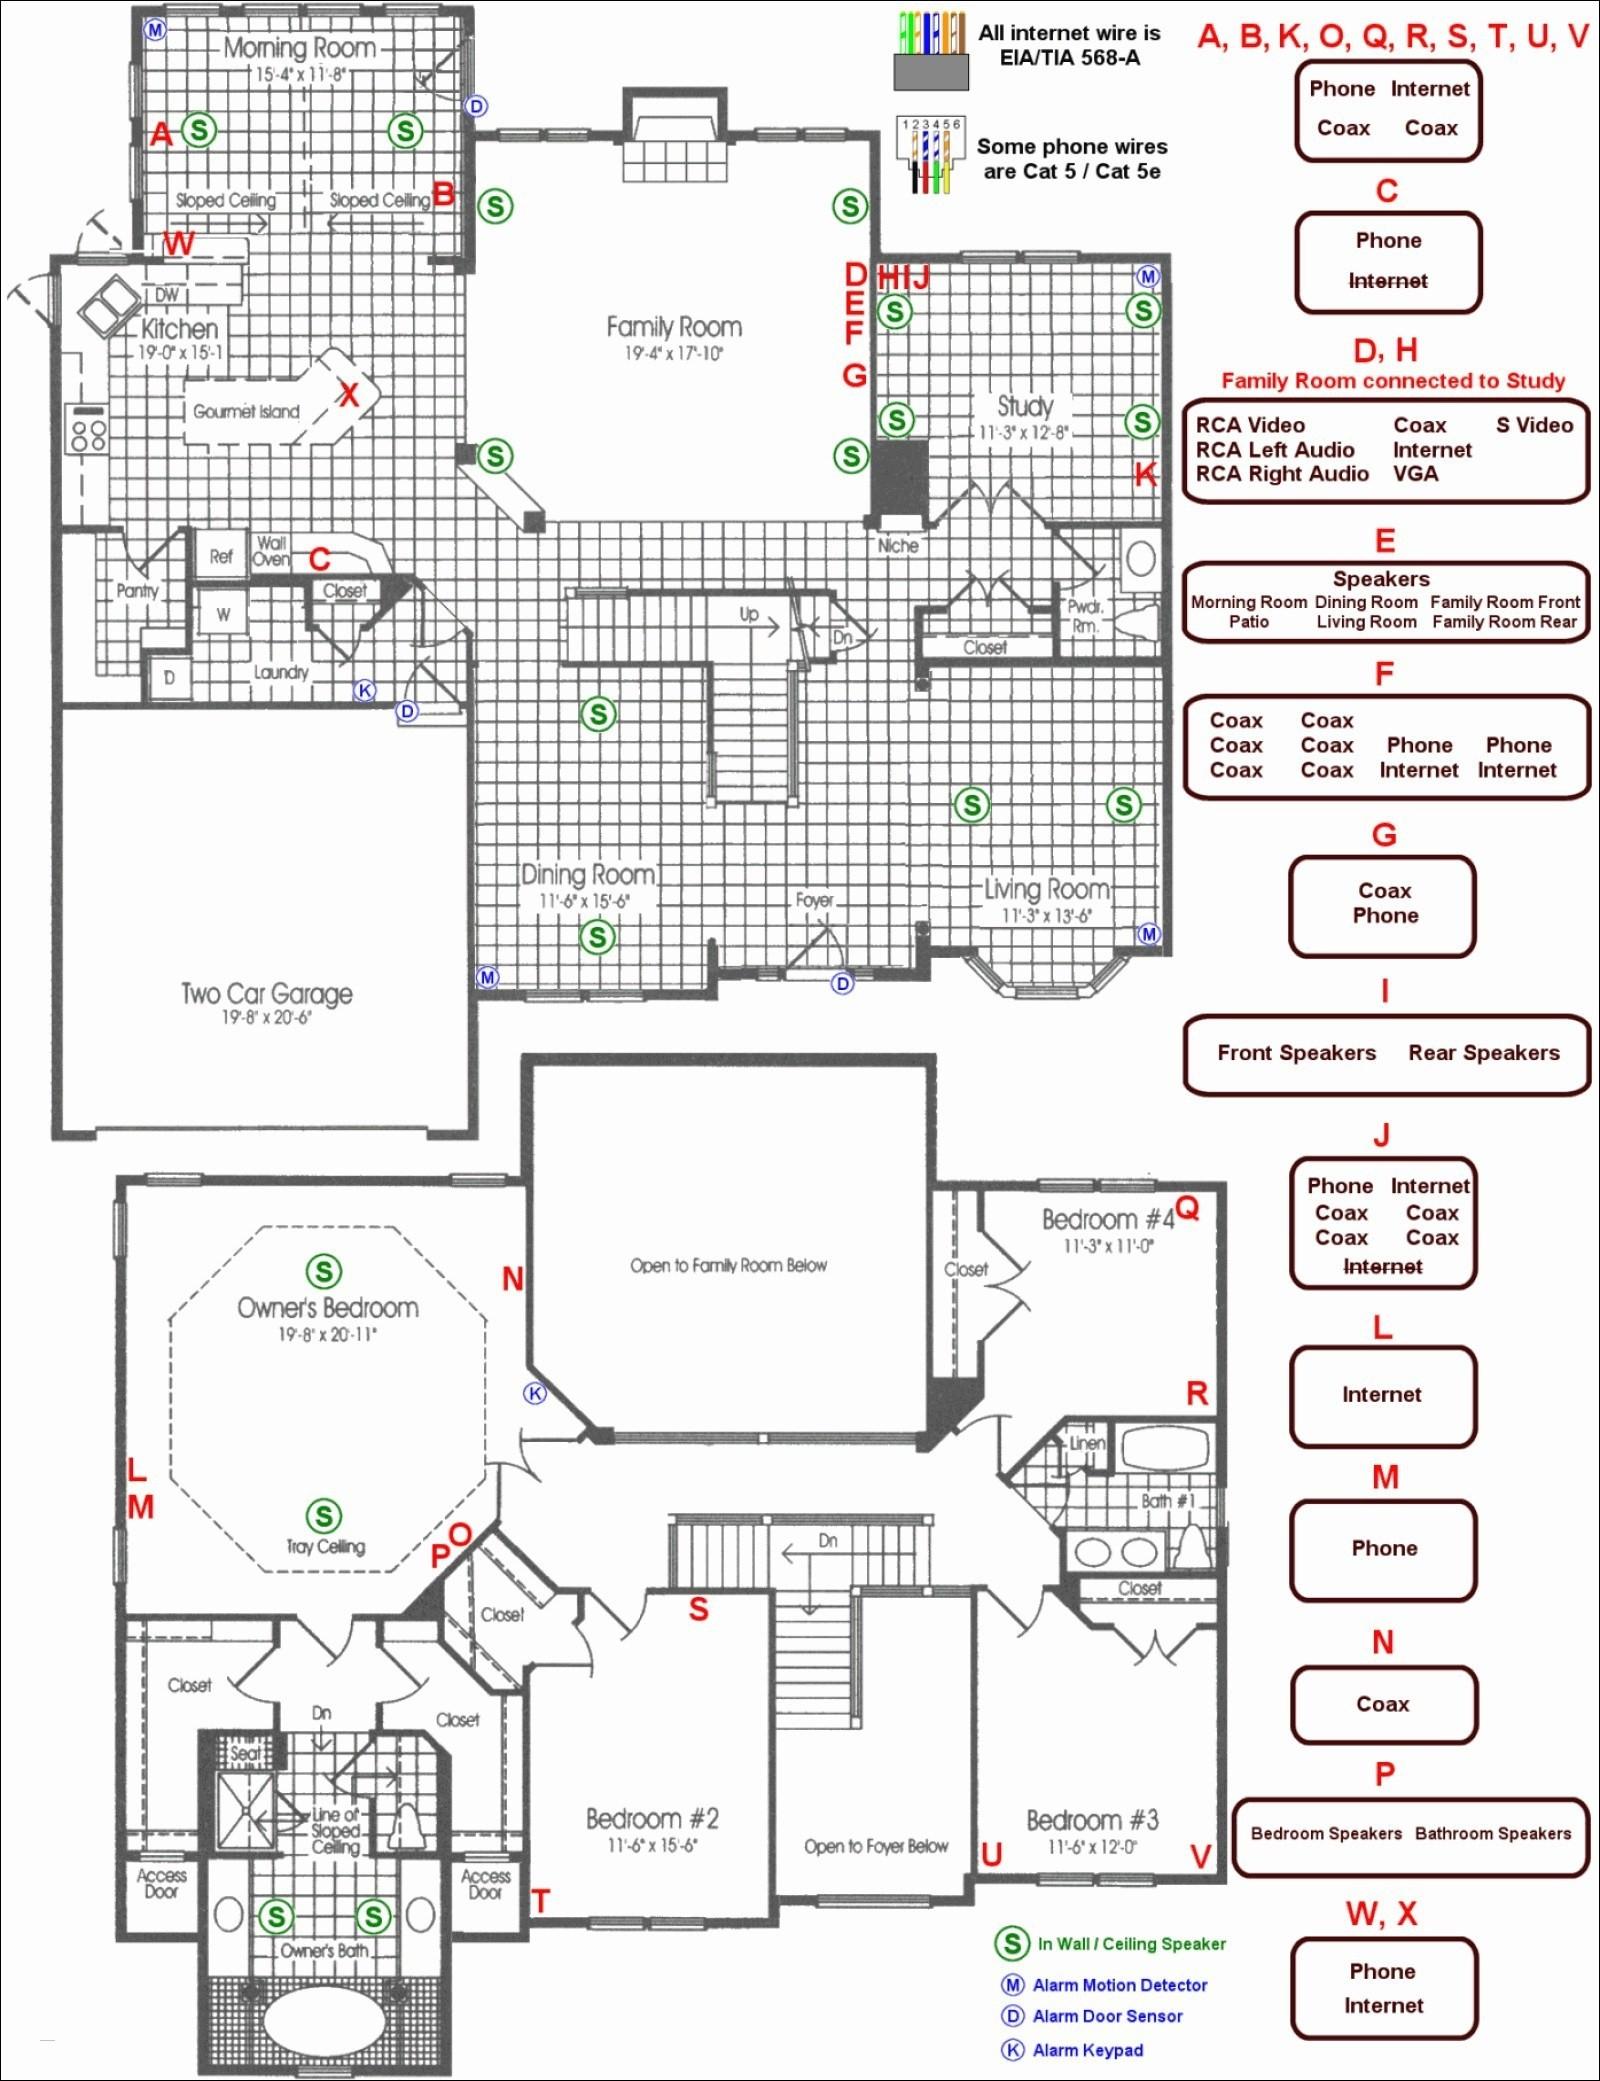 home speaker wiring diagram - wiring diagram for light and power awesome  home speaker wiring diagram